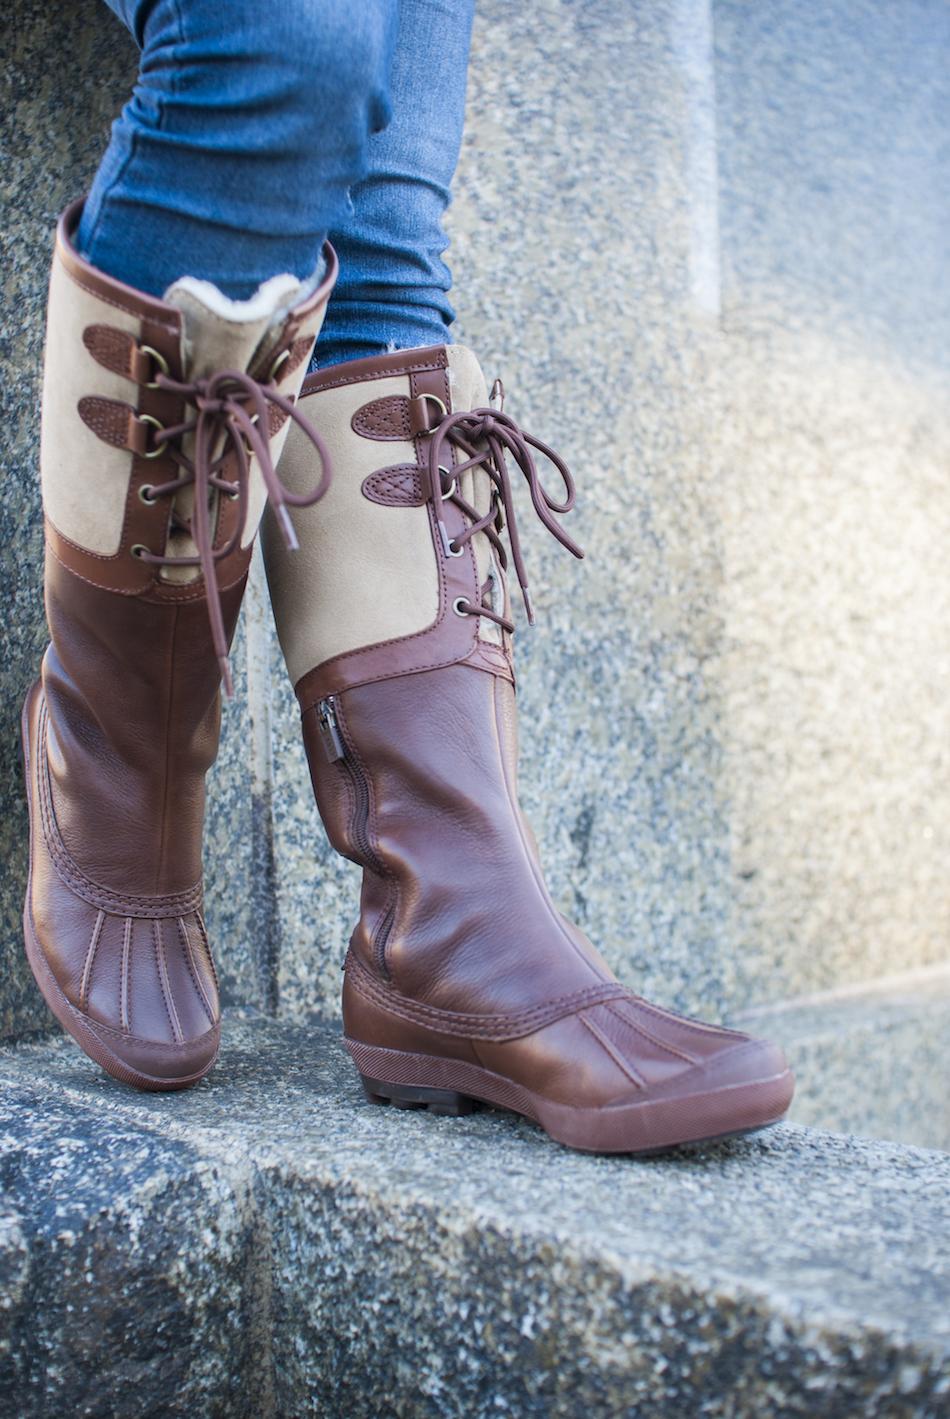 Ugg Australia S Waterproof Leather Duck Boot For Women